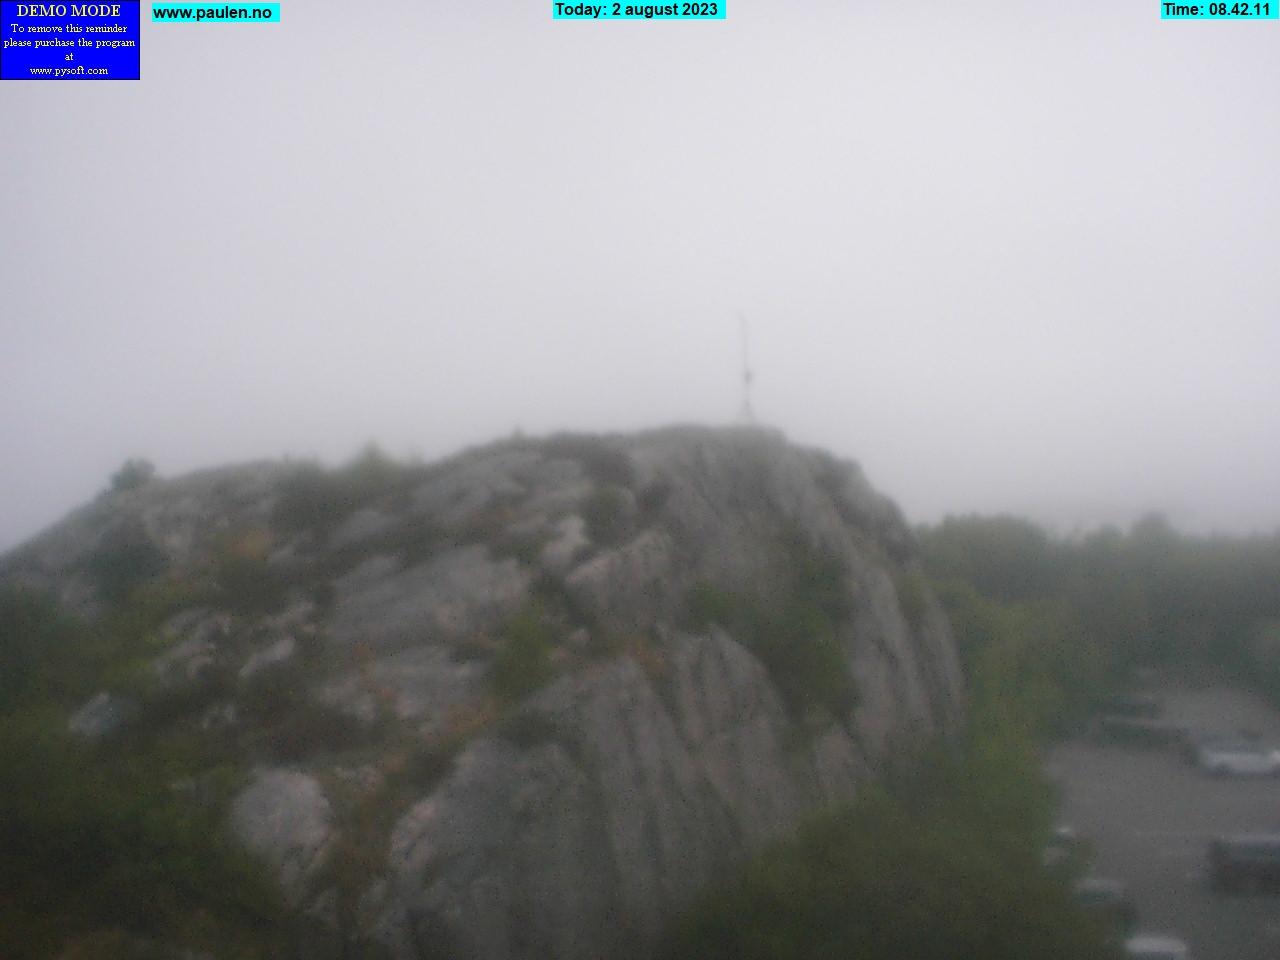 Webcam Skålevik, Kristiansand, Vest-Agder, Norwegen